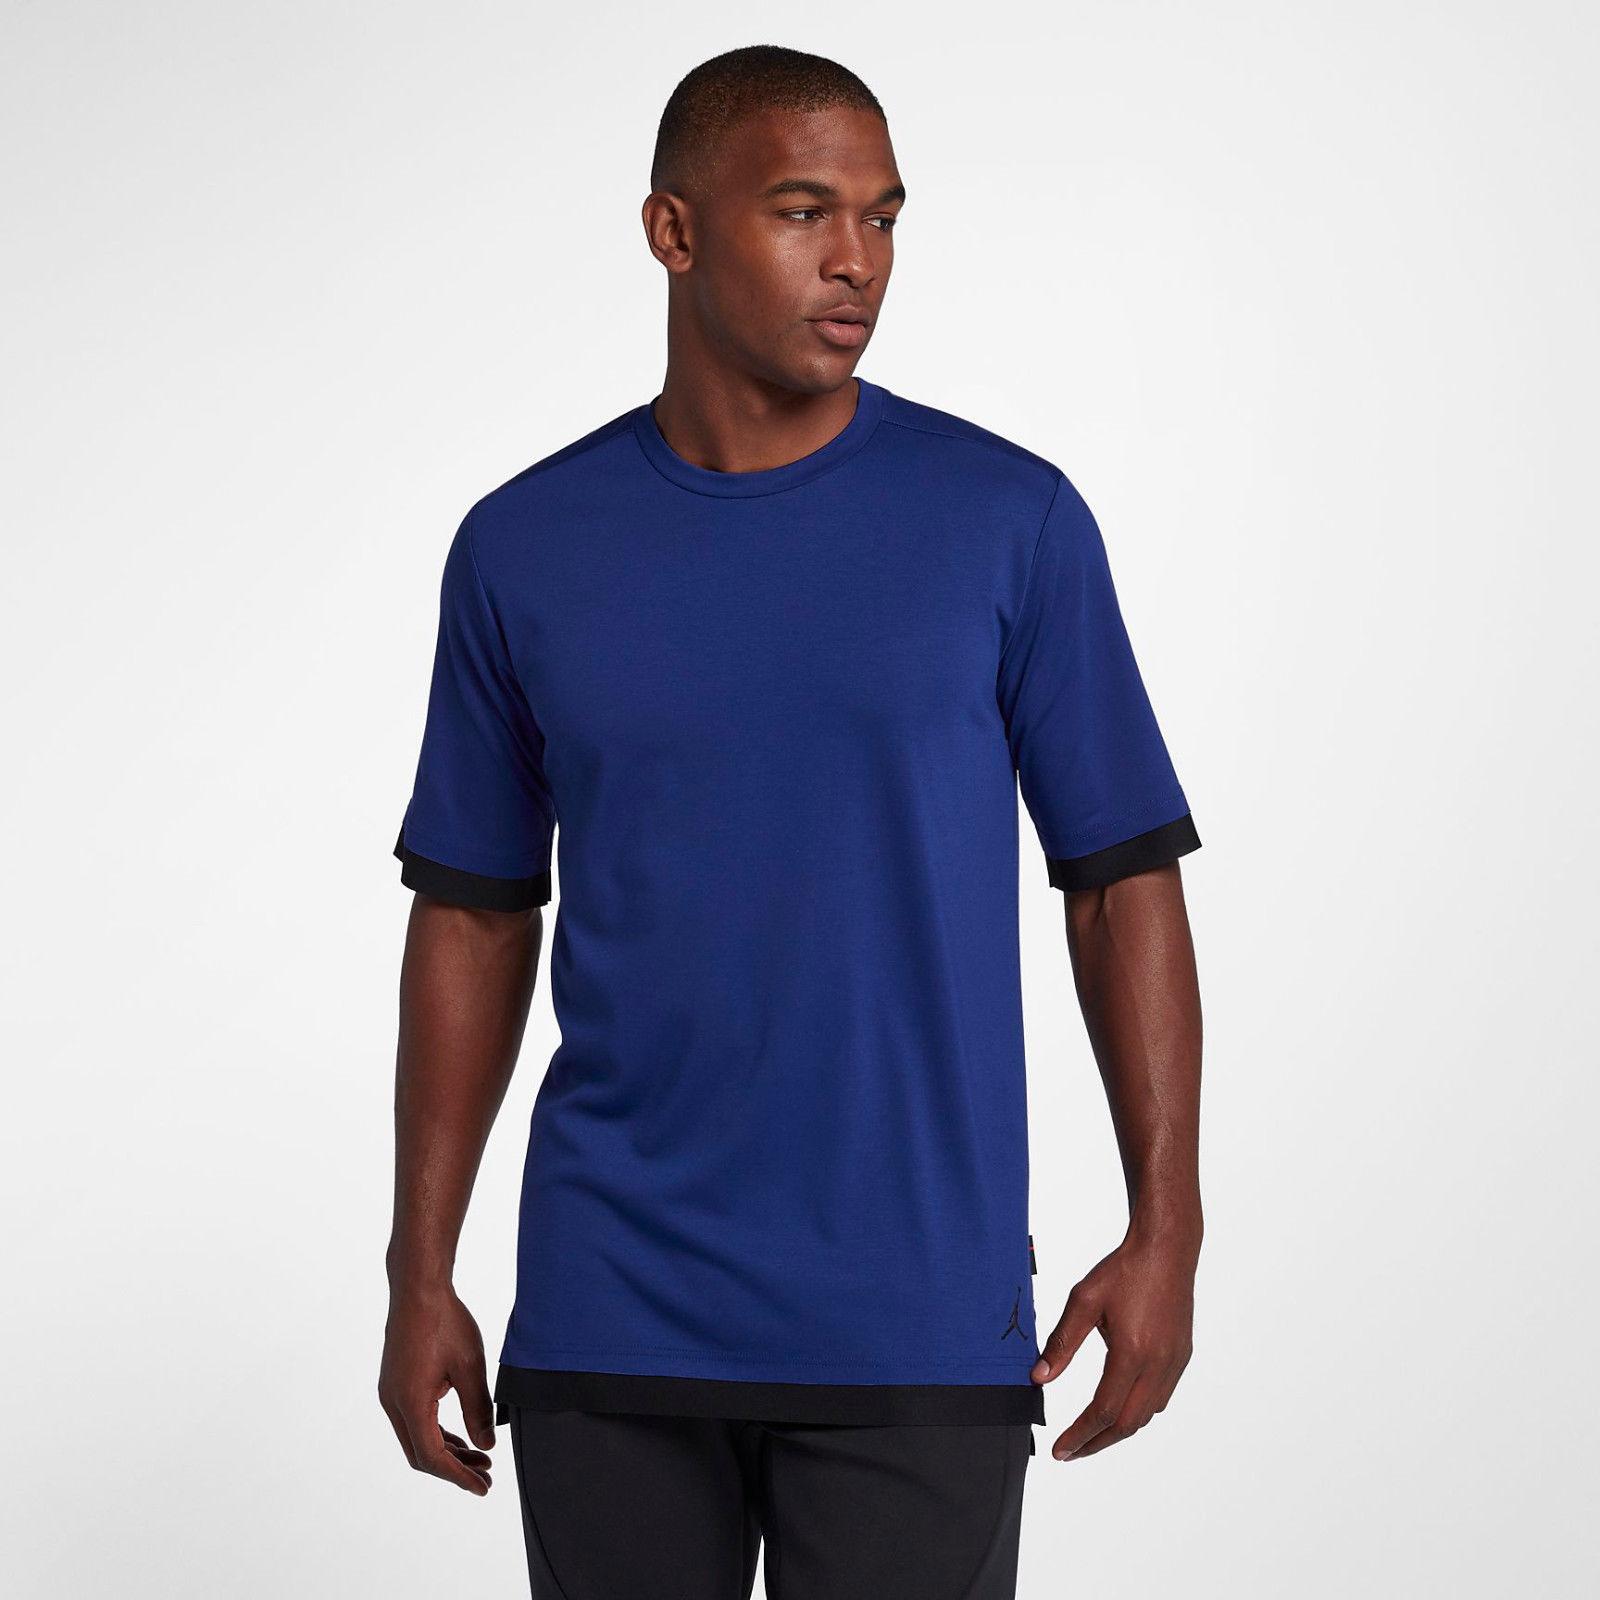 7b607a97f89601 Jordan Lifestyle Tech Tee - SPORTING GOODS Sports Shirts